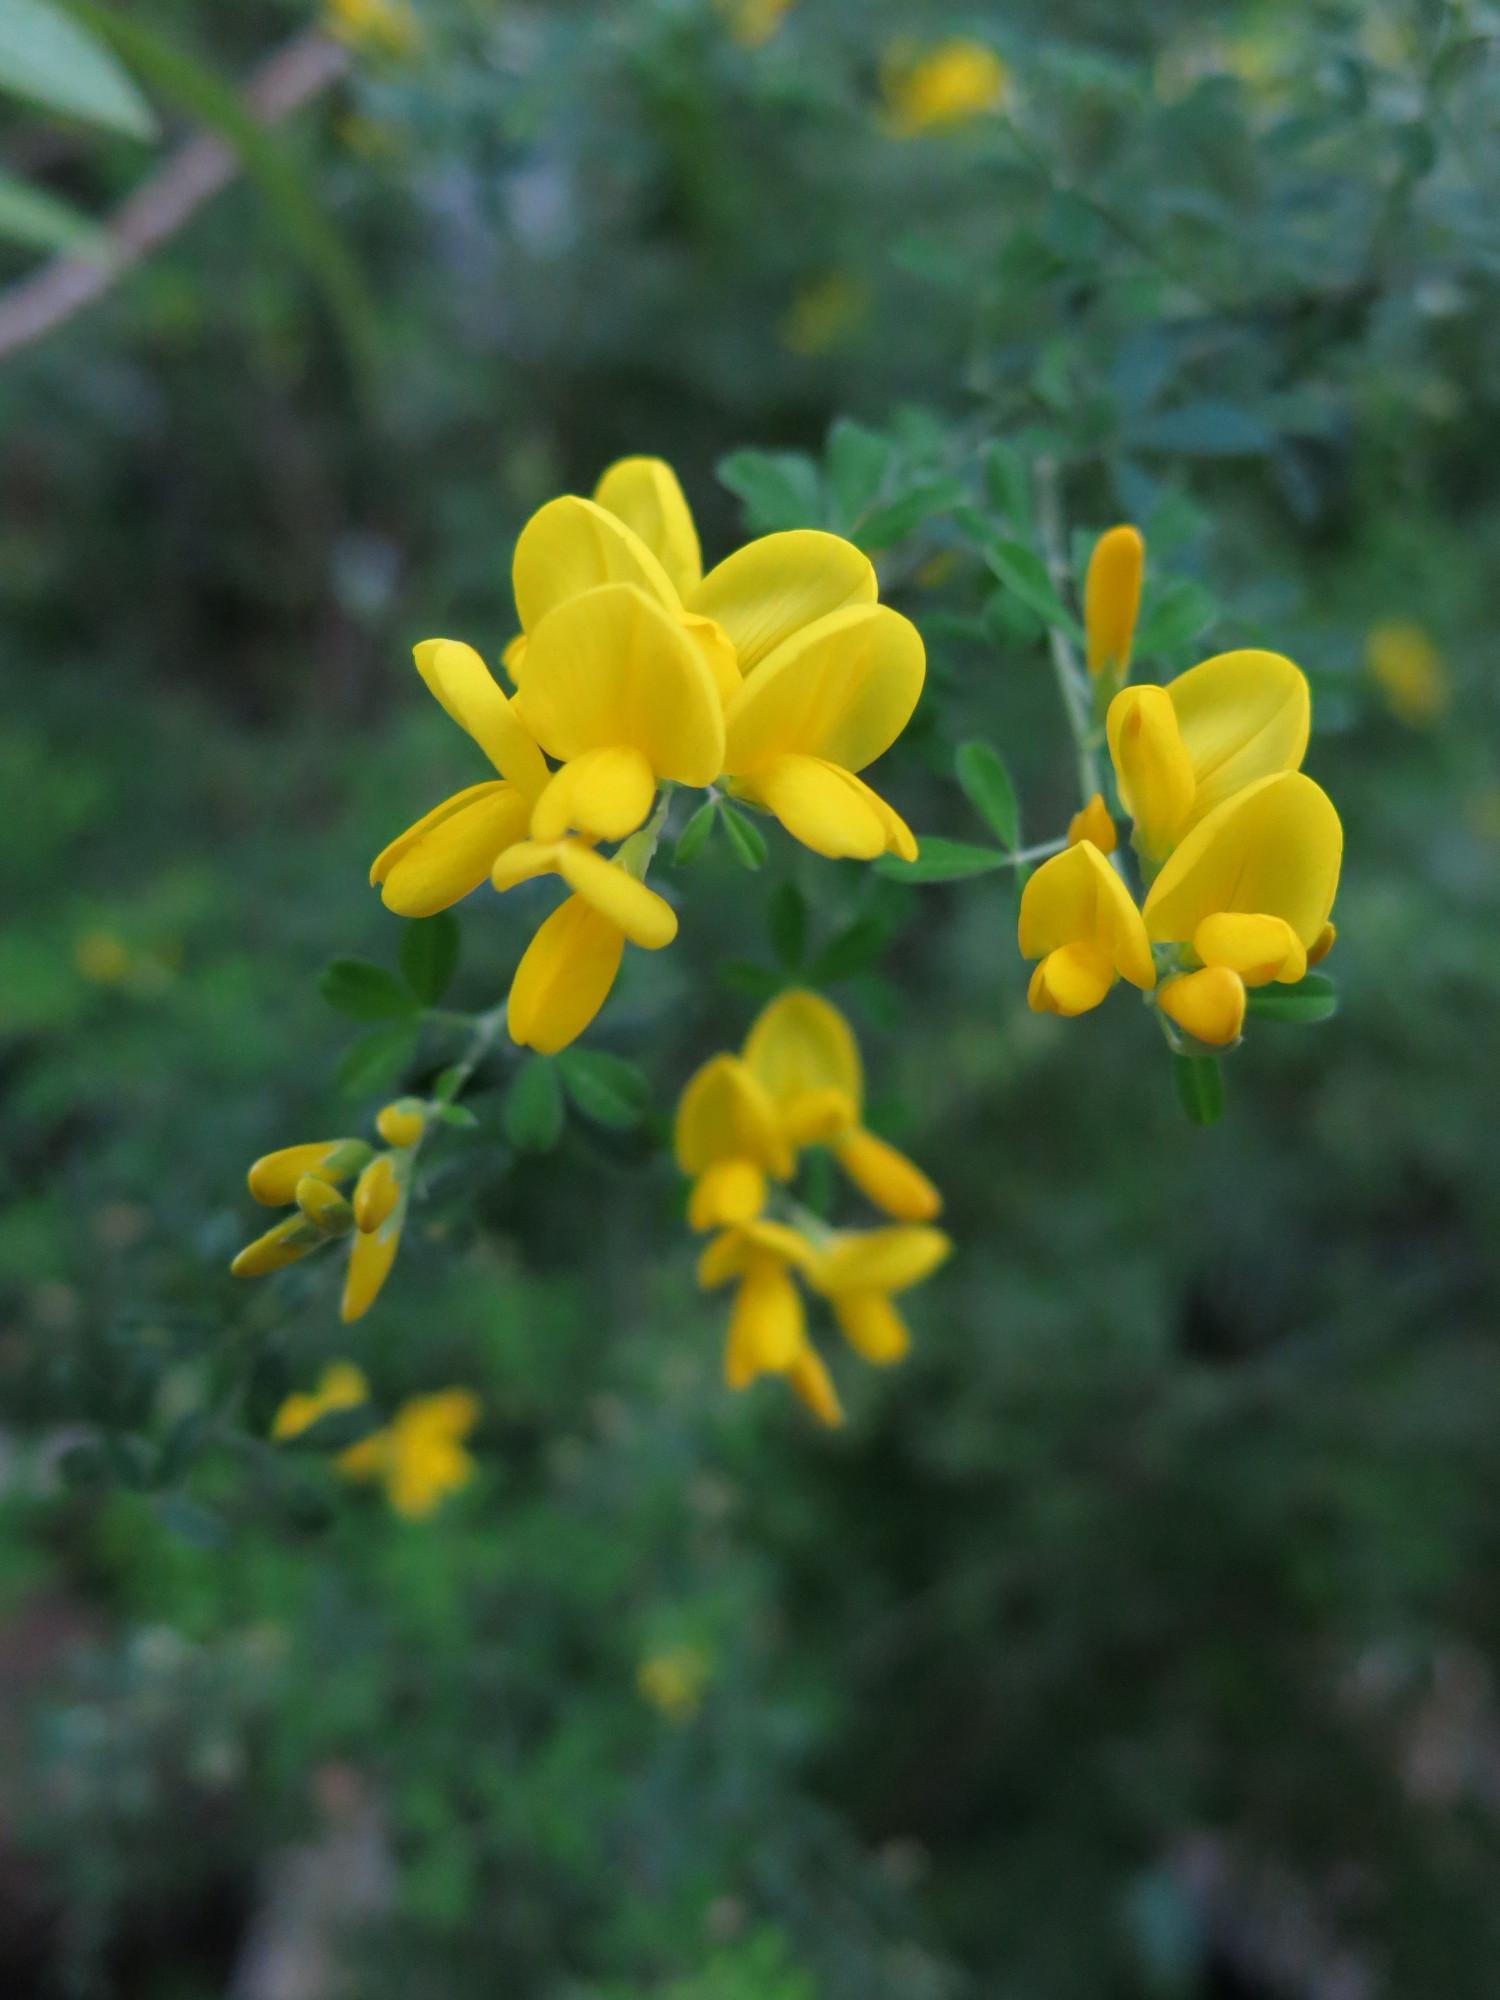 Акация желтая, запах такой сладкий, пленяющий